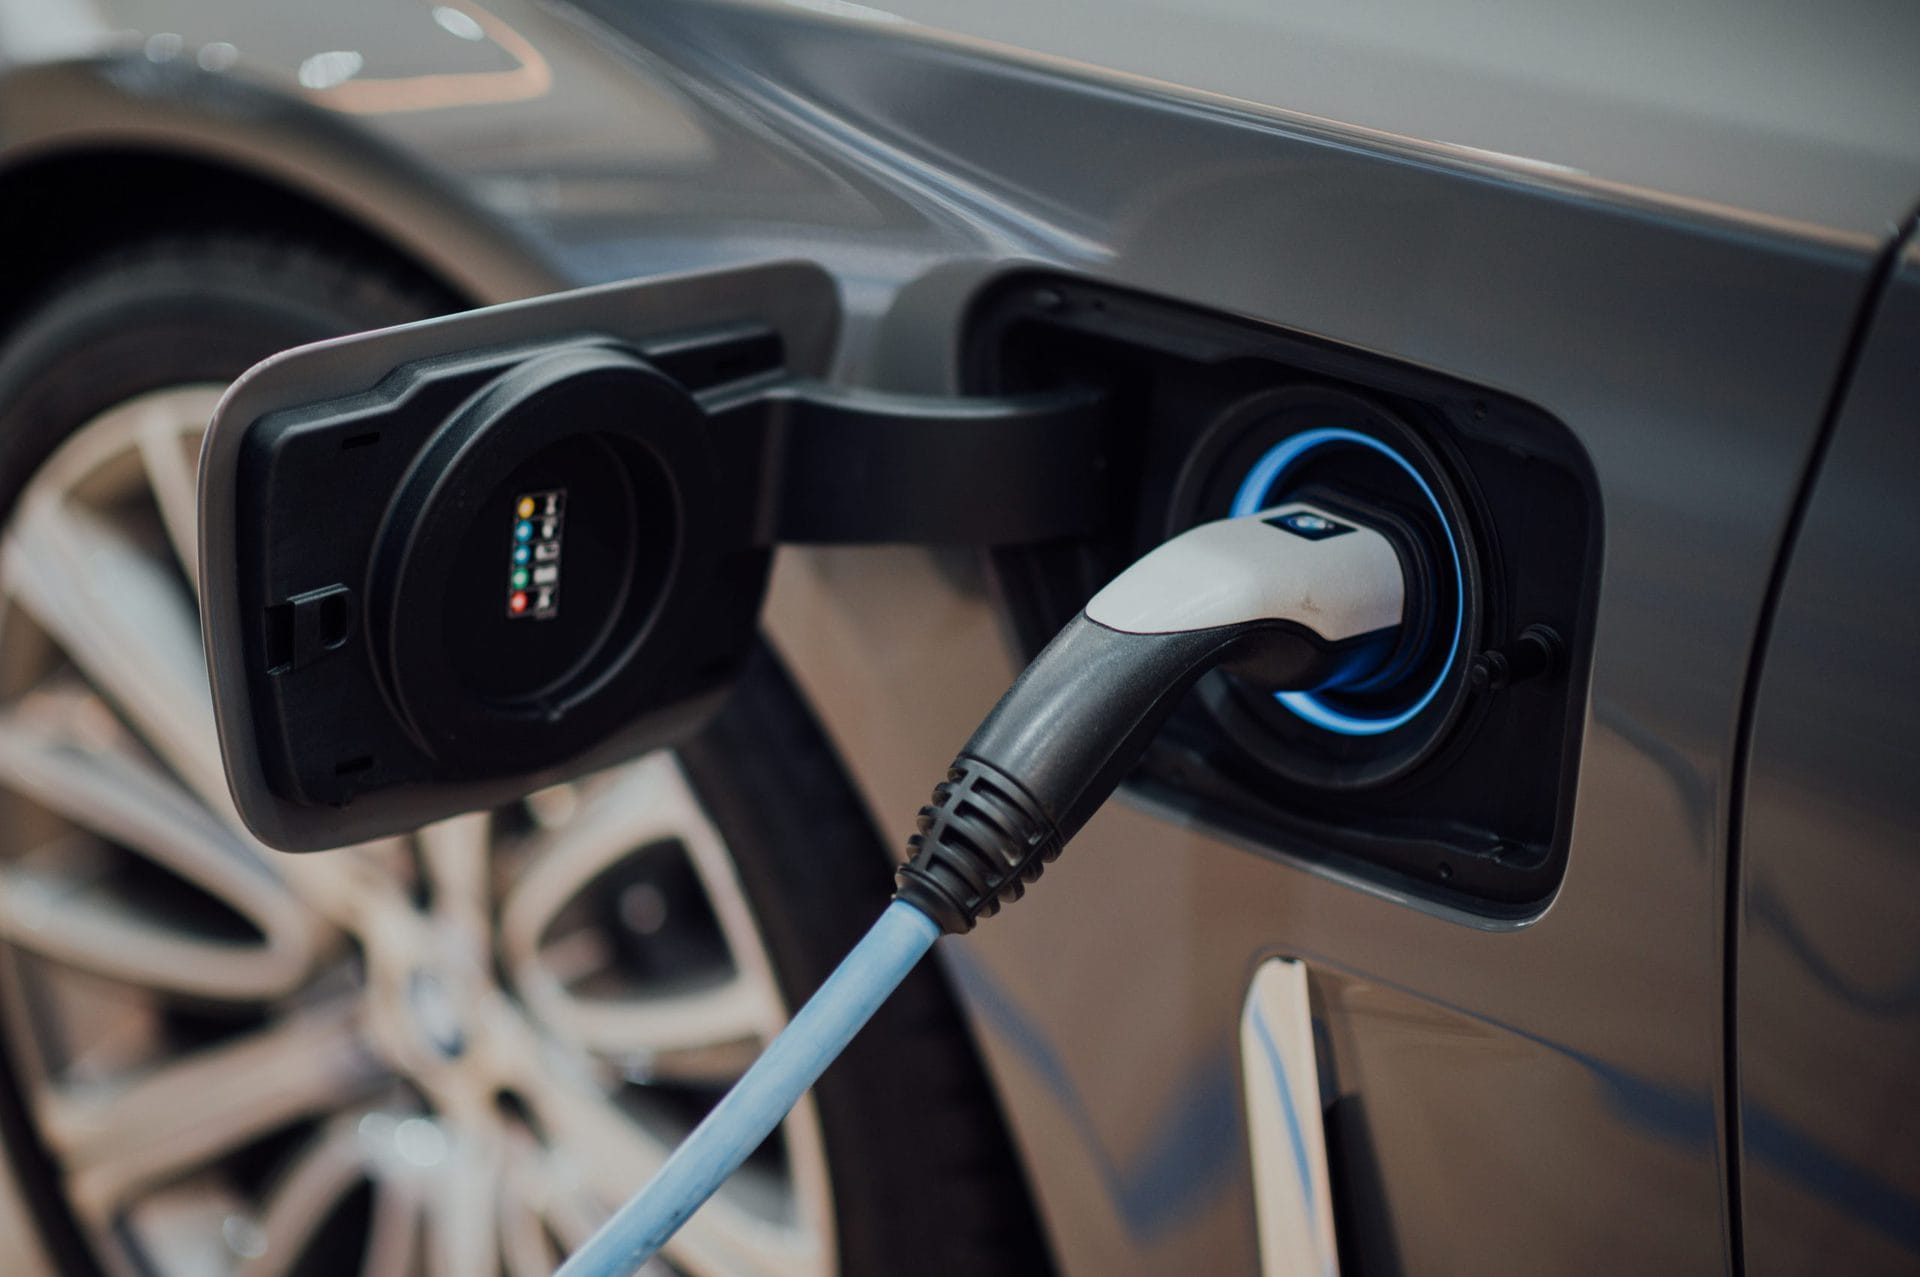 E-Auto leasen: Emissionsfreier Fahrspaß für jedermann? Das Prinzip des Leasings